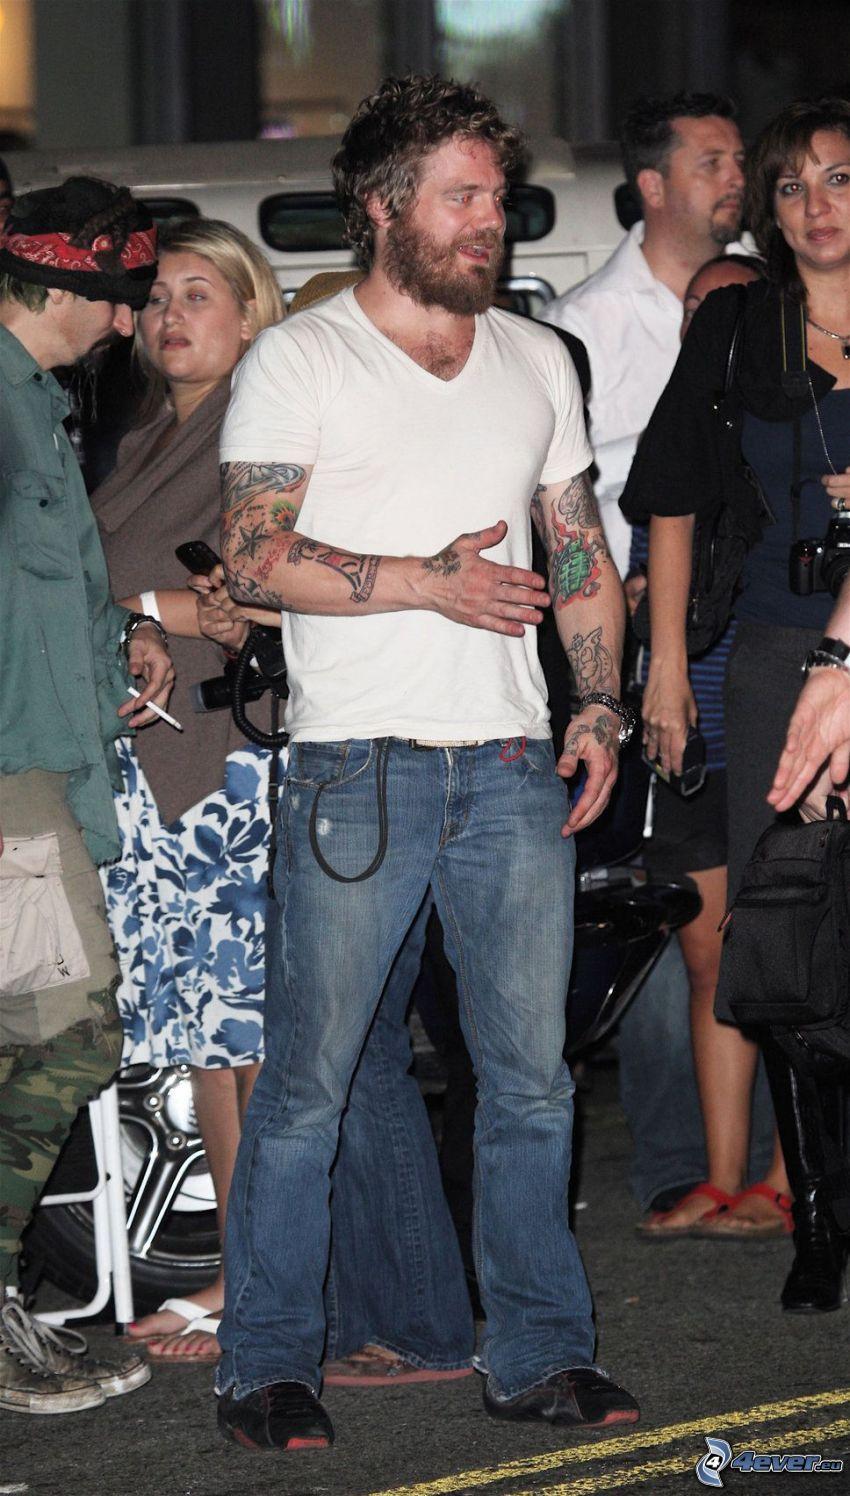 Ryan Dunn, tattooed guy